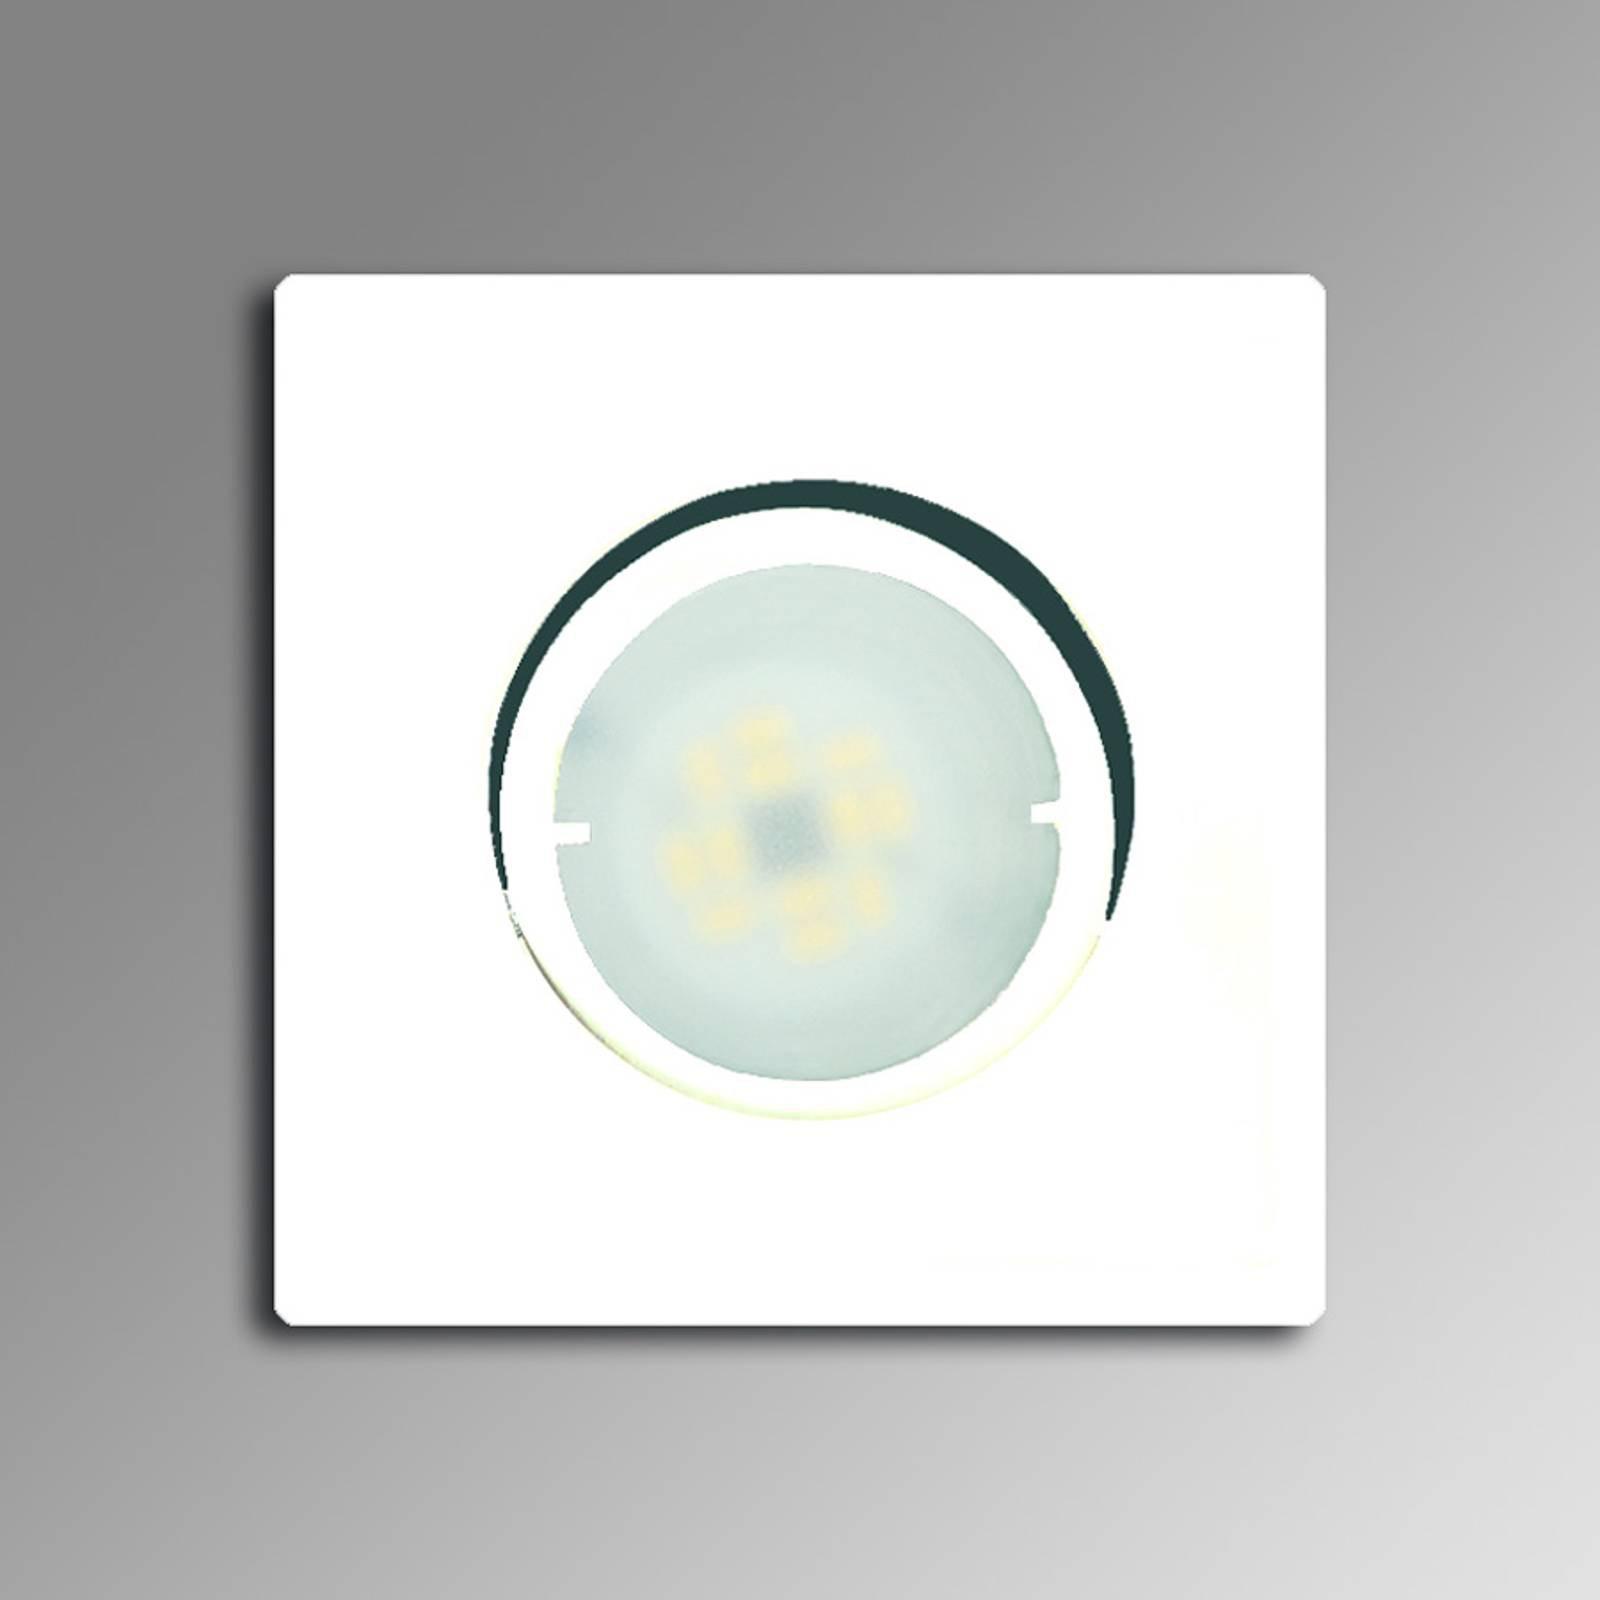 Hvit LED-innbyggingslampe Joanie, justerbar